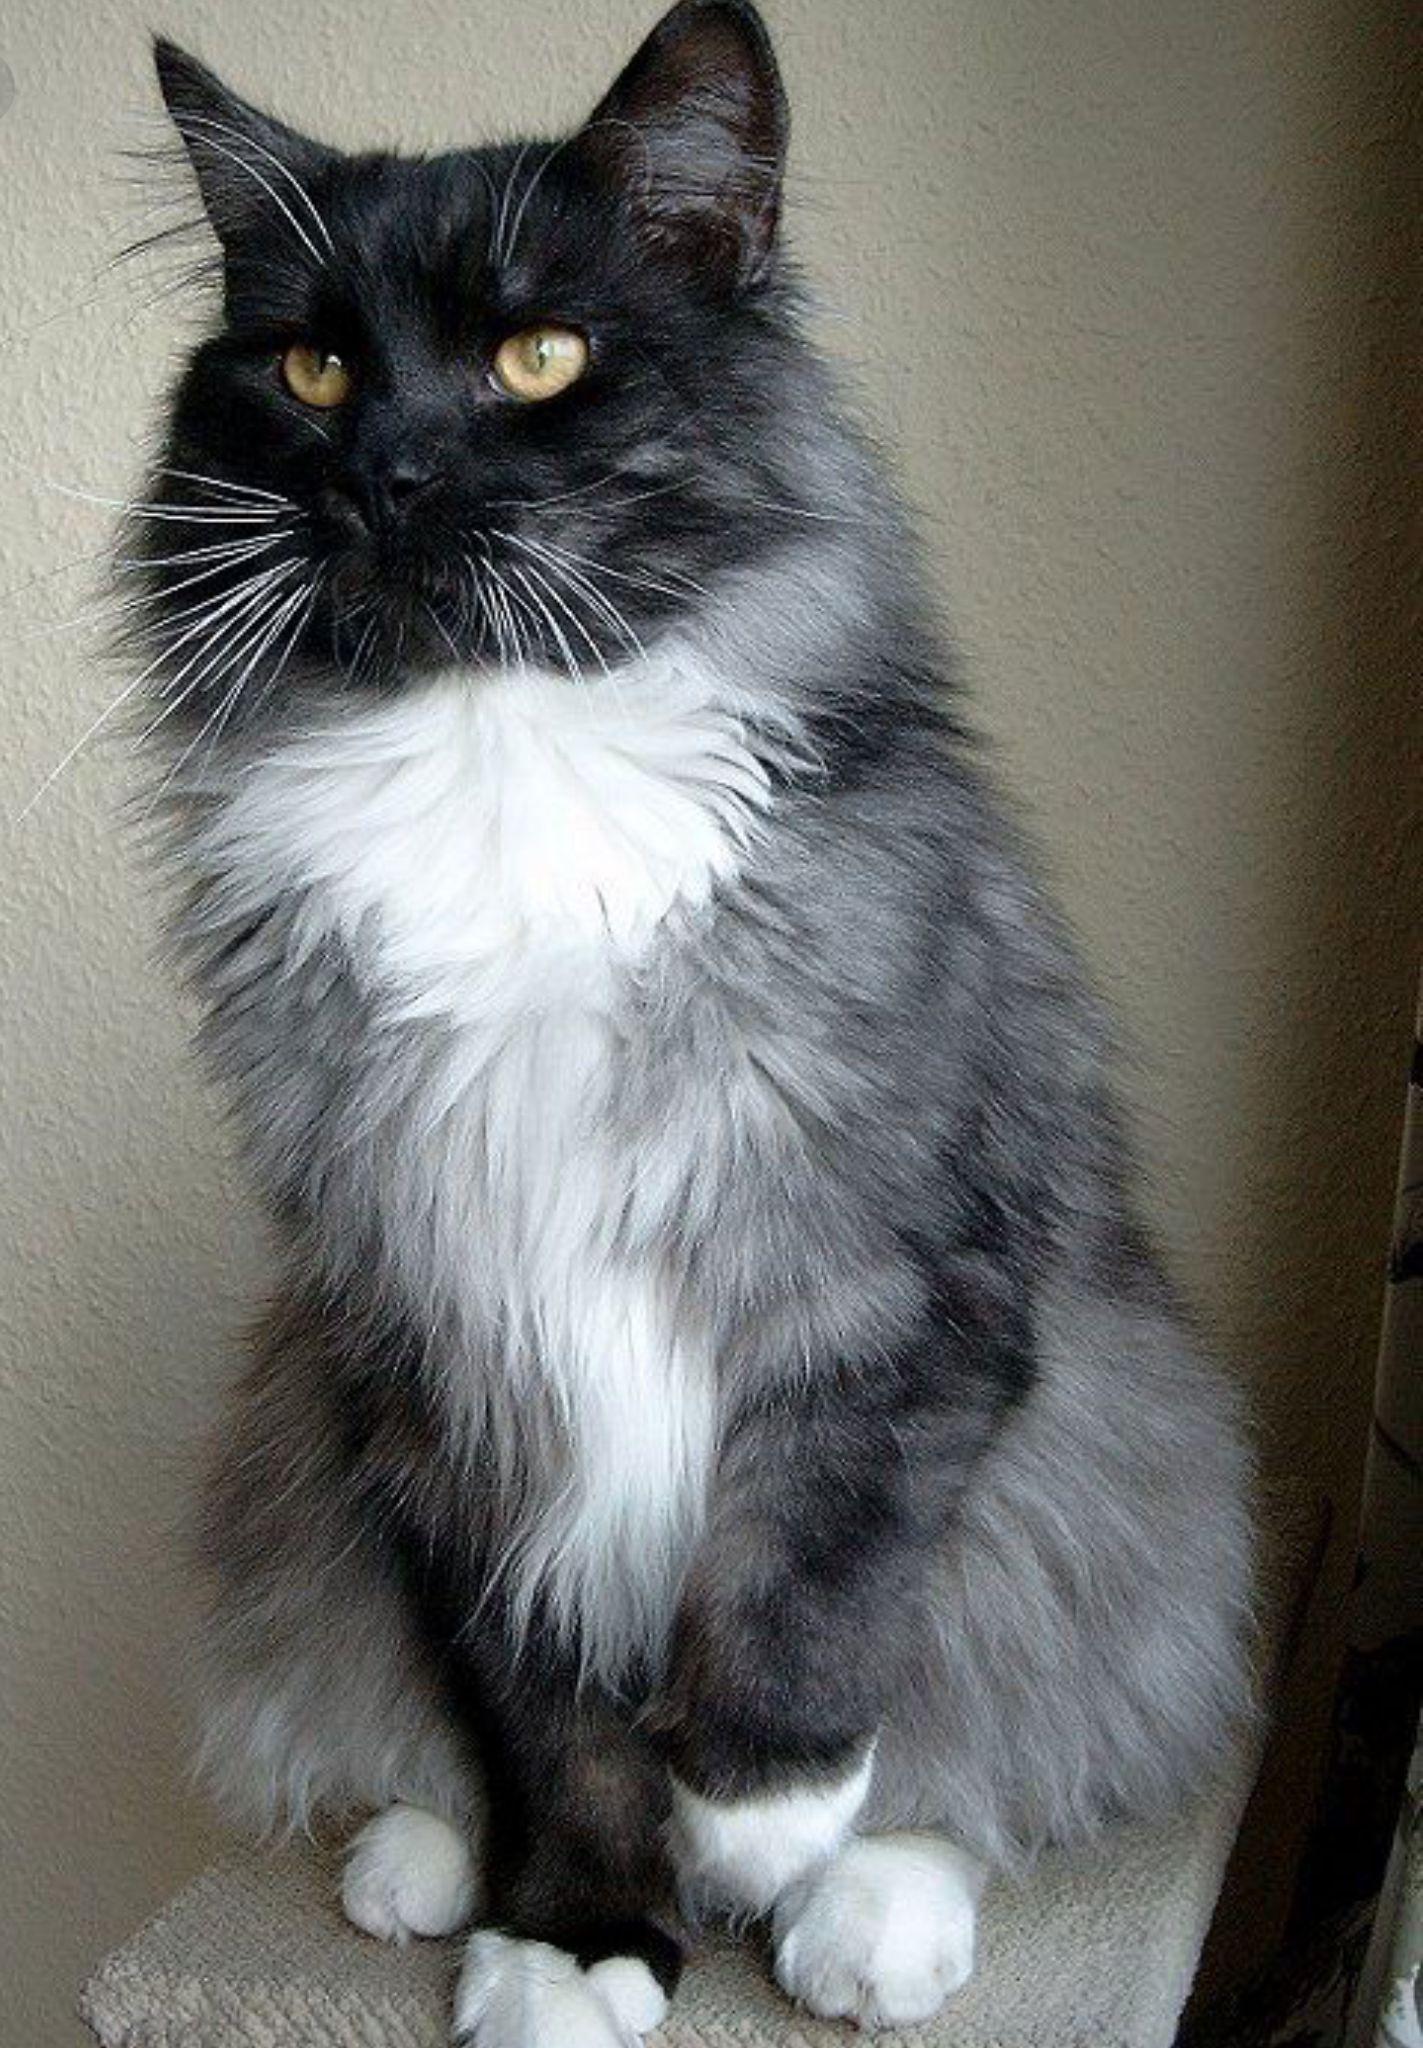 Pin By Shari Beckett On Grey Tuxedo Cats White Tabby Cat Cute Cats And Kittens Tabby Cat